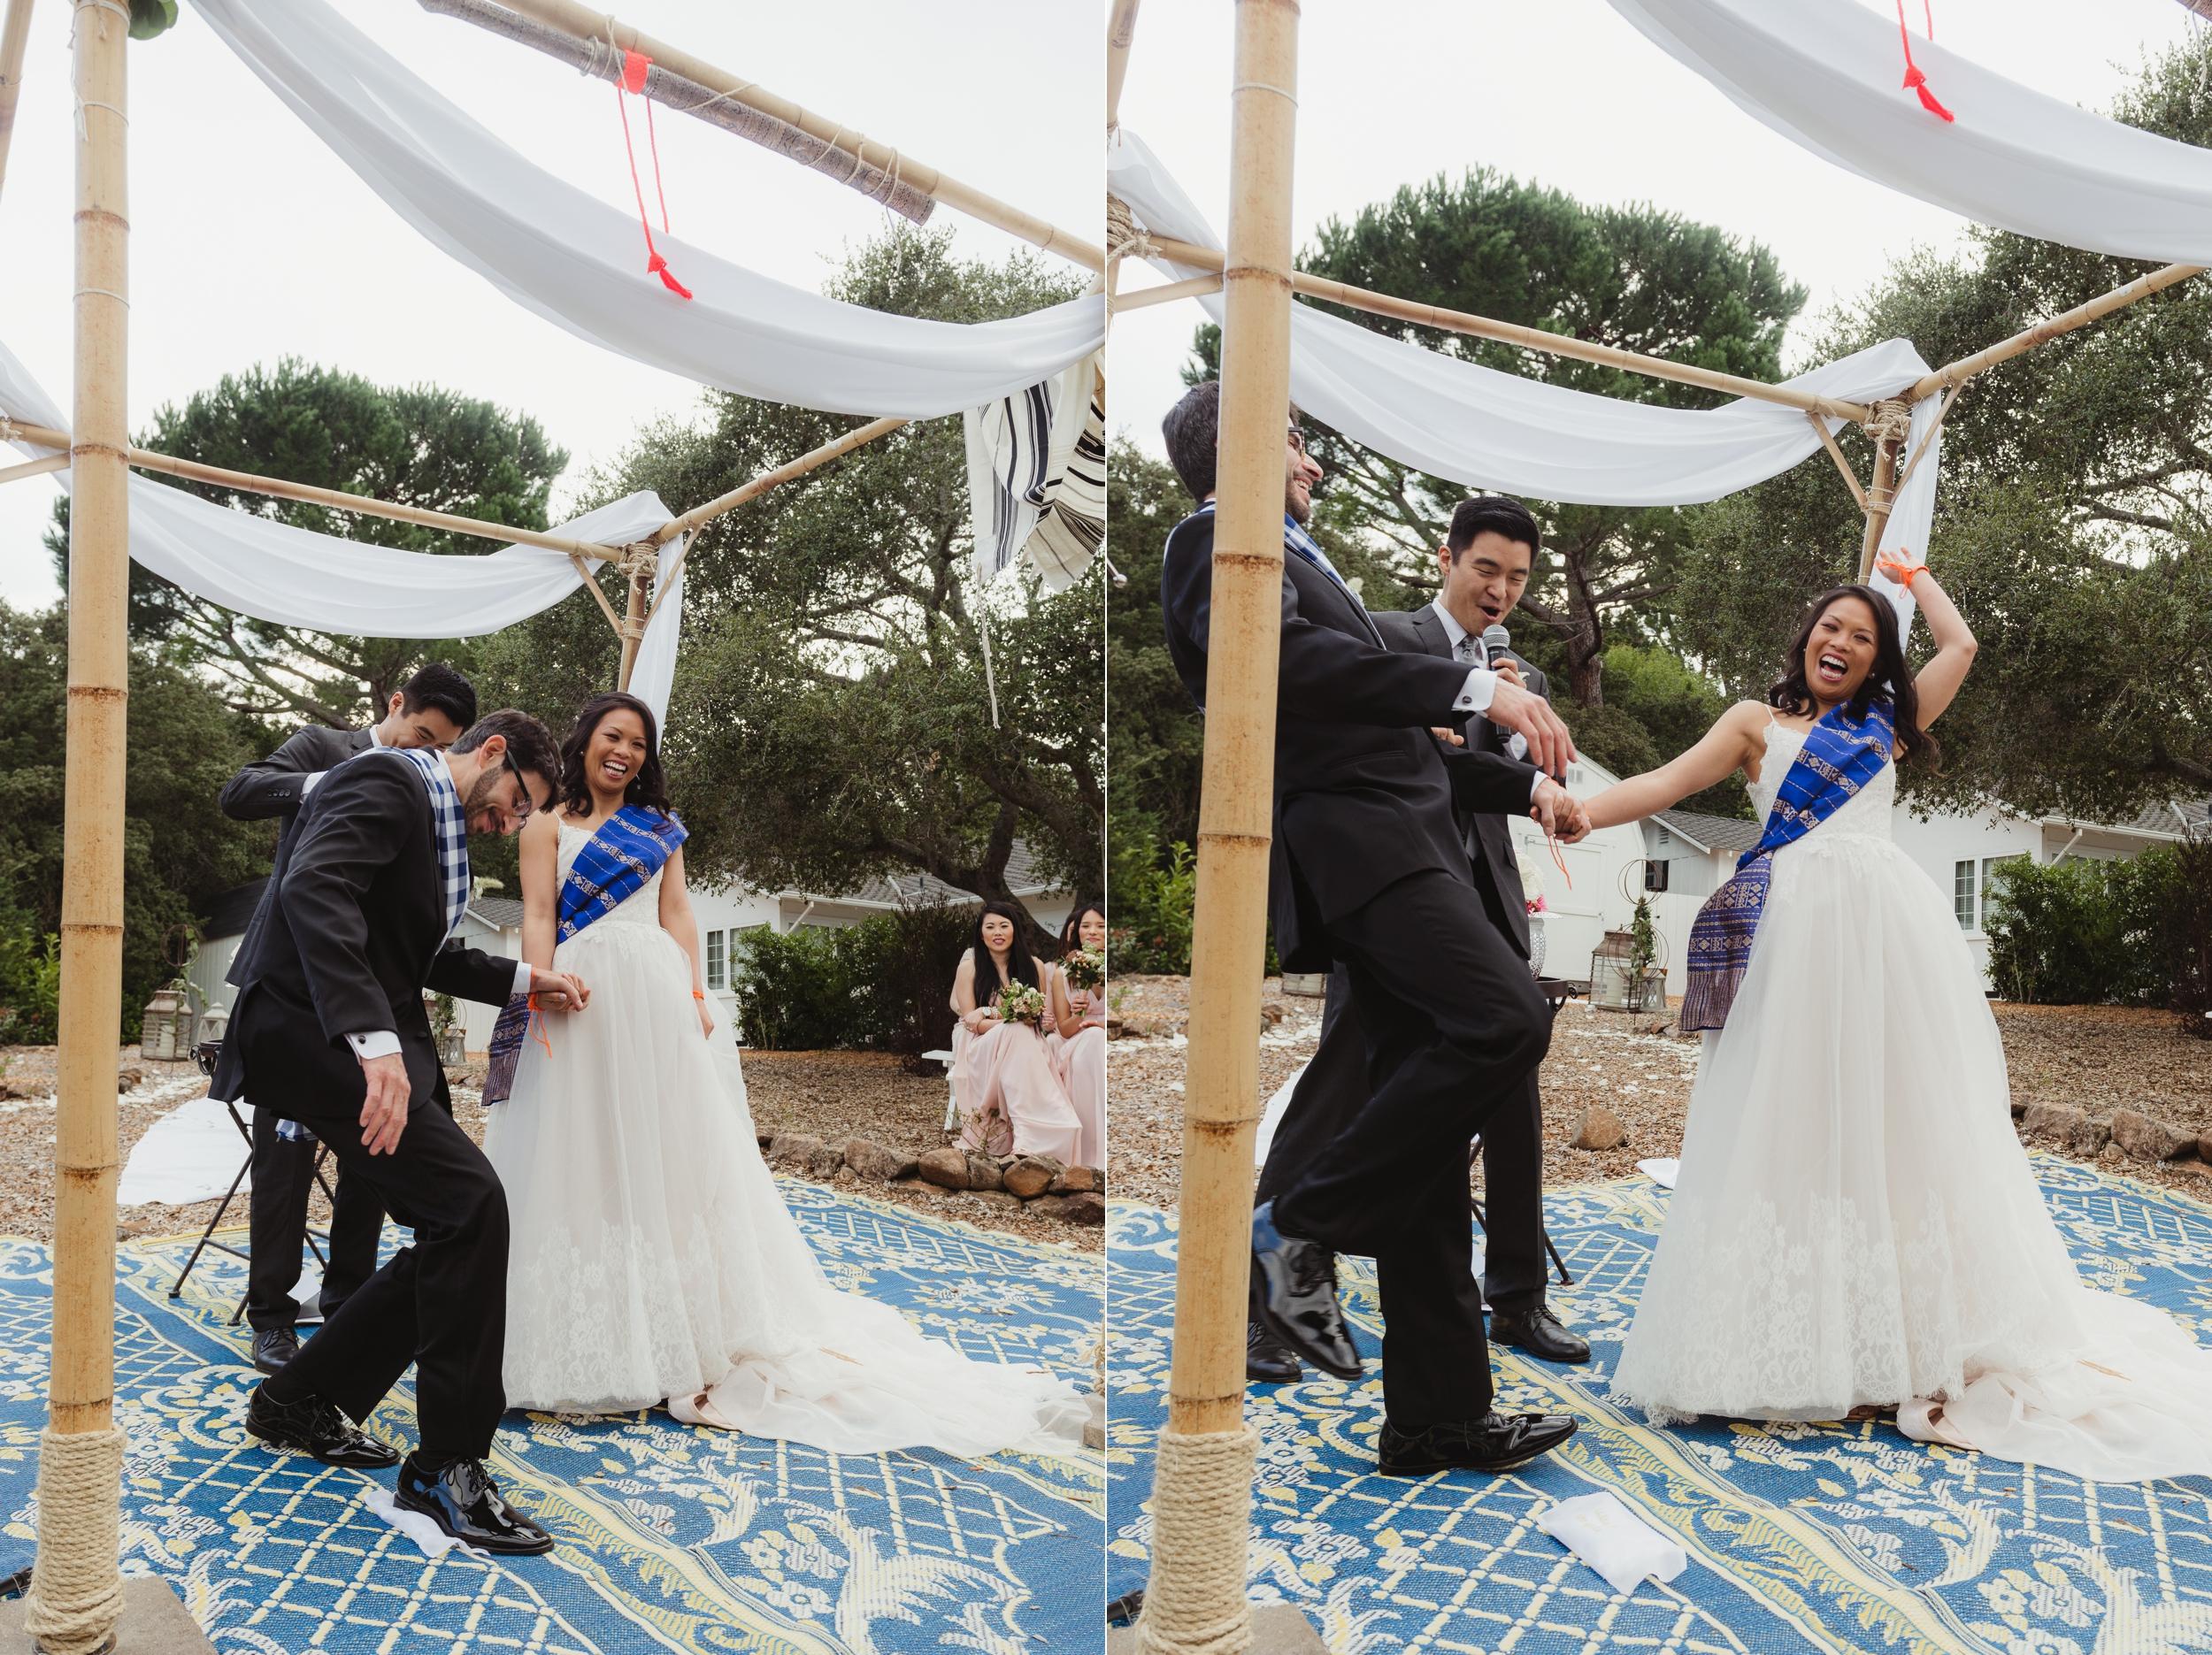 26-woodside-backyard-wedding-vivianchen-0454_WEB.jpg